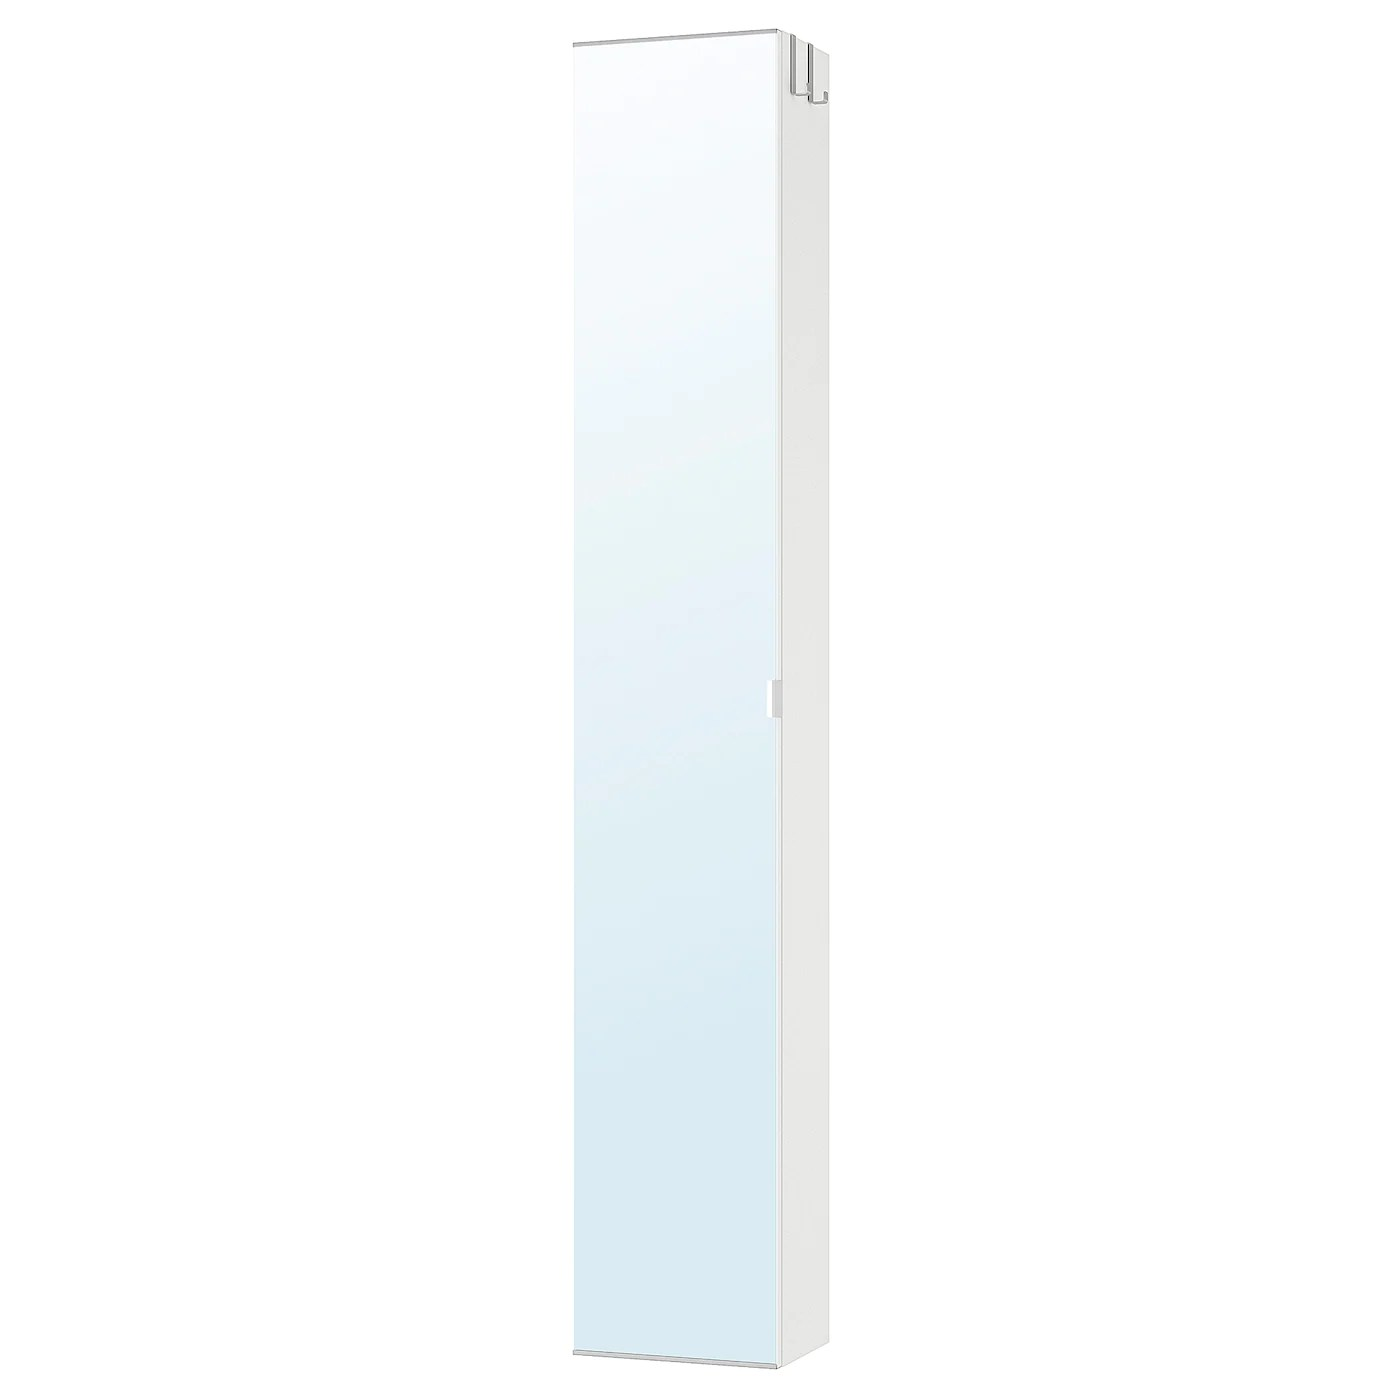 Lillangen Armoire Haute A Porte Miroir Blanc 30x21x179cm Ikea Canada Ikea